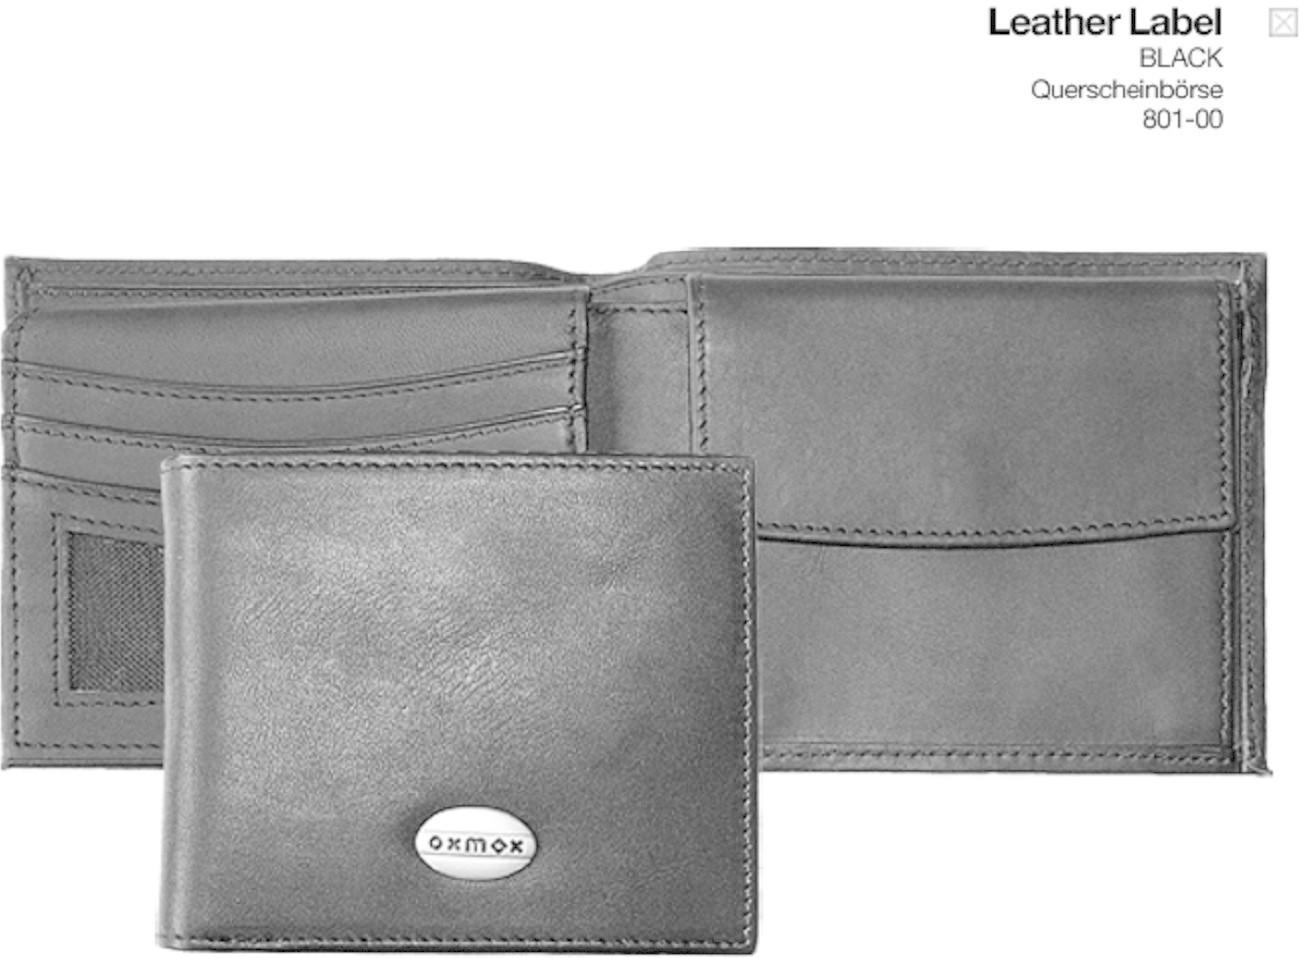 Oxmox Leather Querscheinbörse (80801) black